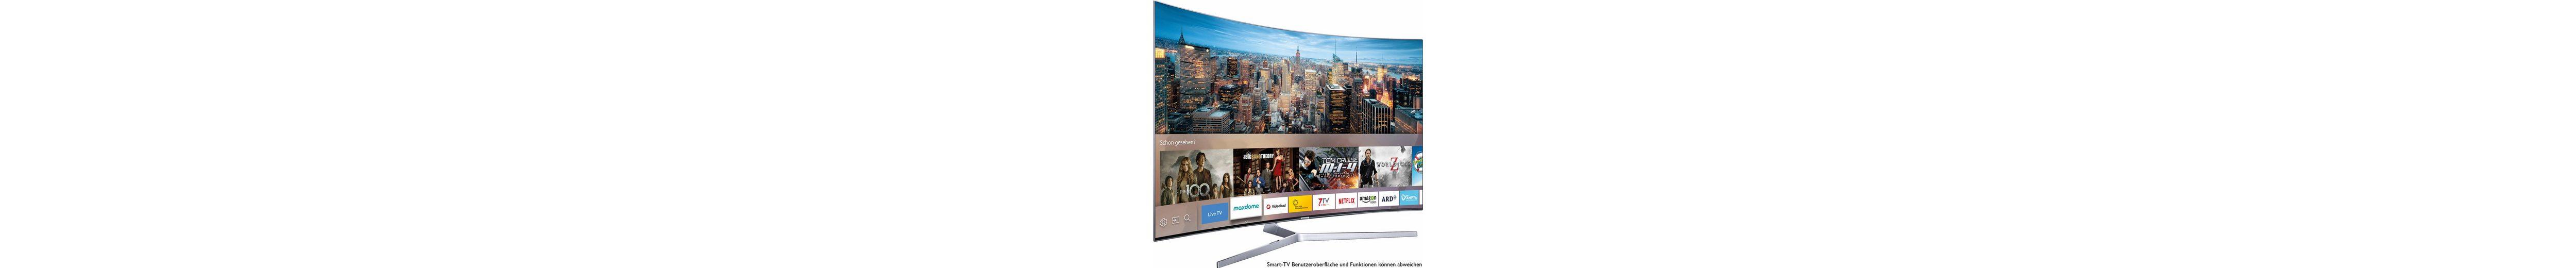 Samsung UE65KS9590UXZG, Curved-LED-Fernseher, 163 cm (65 Zoll), 2160p (SUHD), Smart-TV